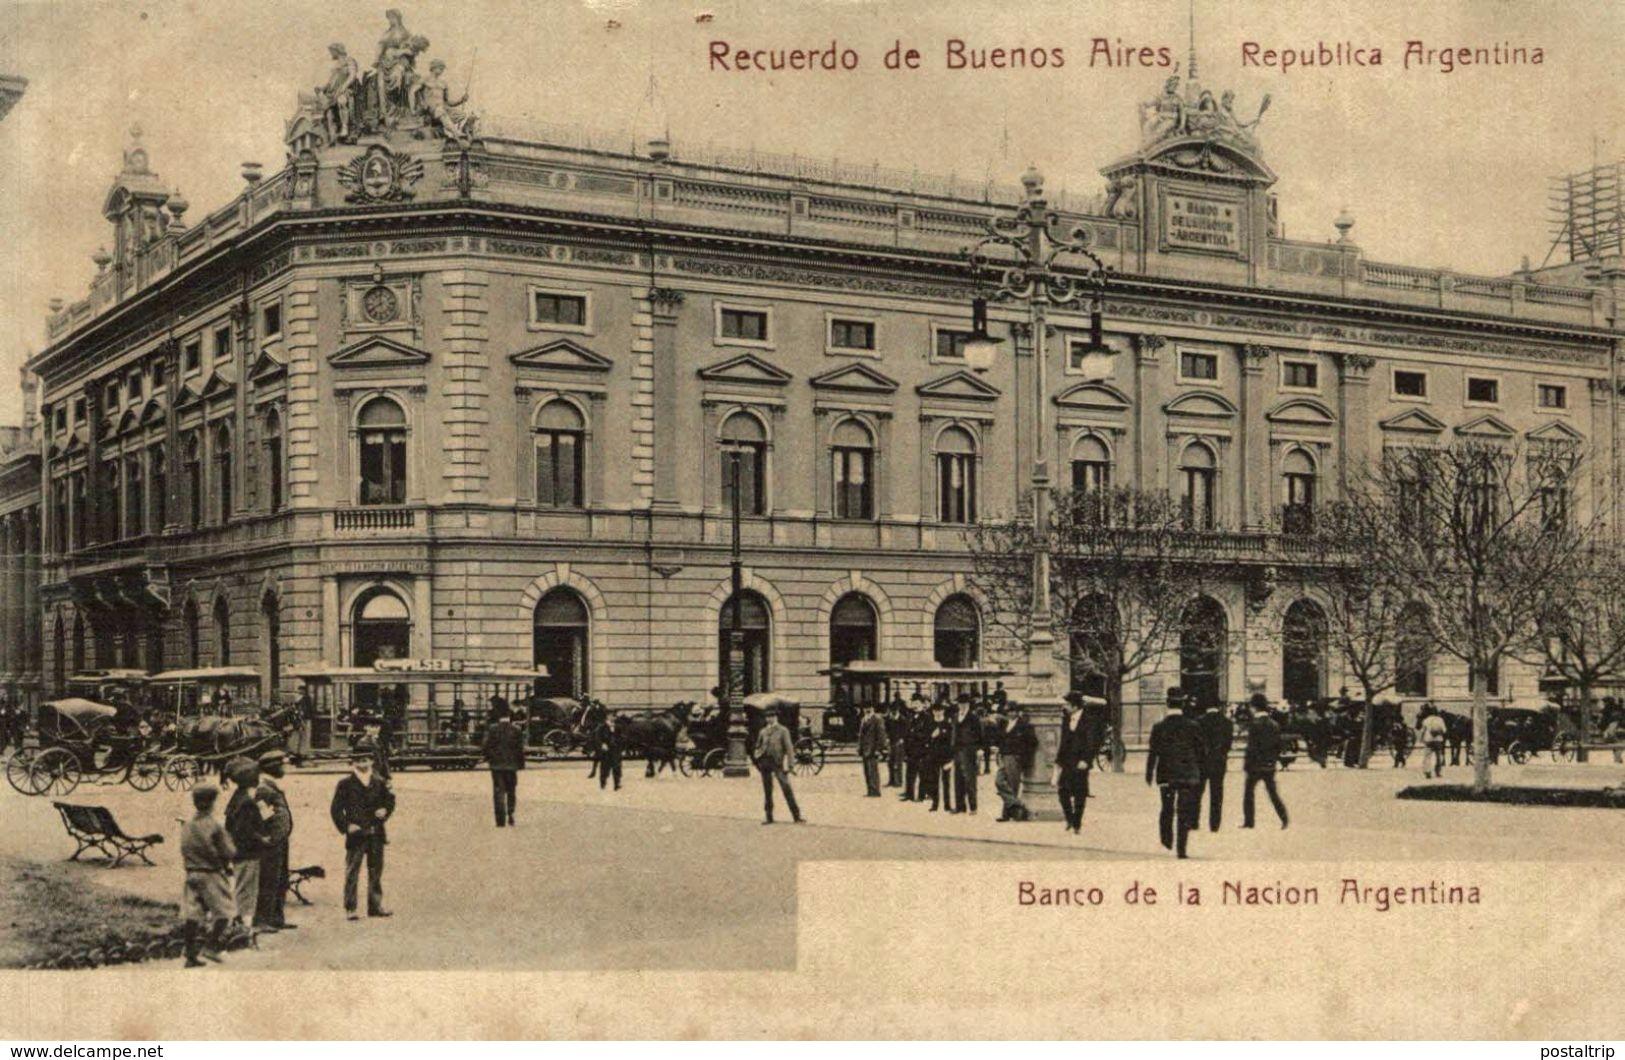 RECUERDO DE BUENOS AIRES REPUBLICA ARGENTINA BANCO DE LA NACION ARGENTINA - Argentina